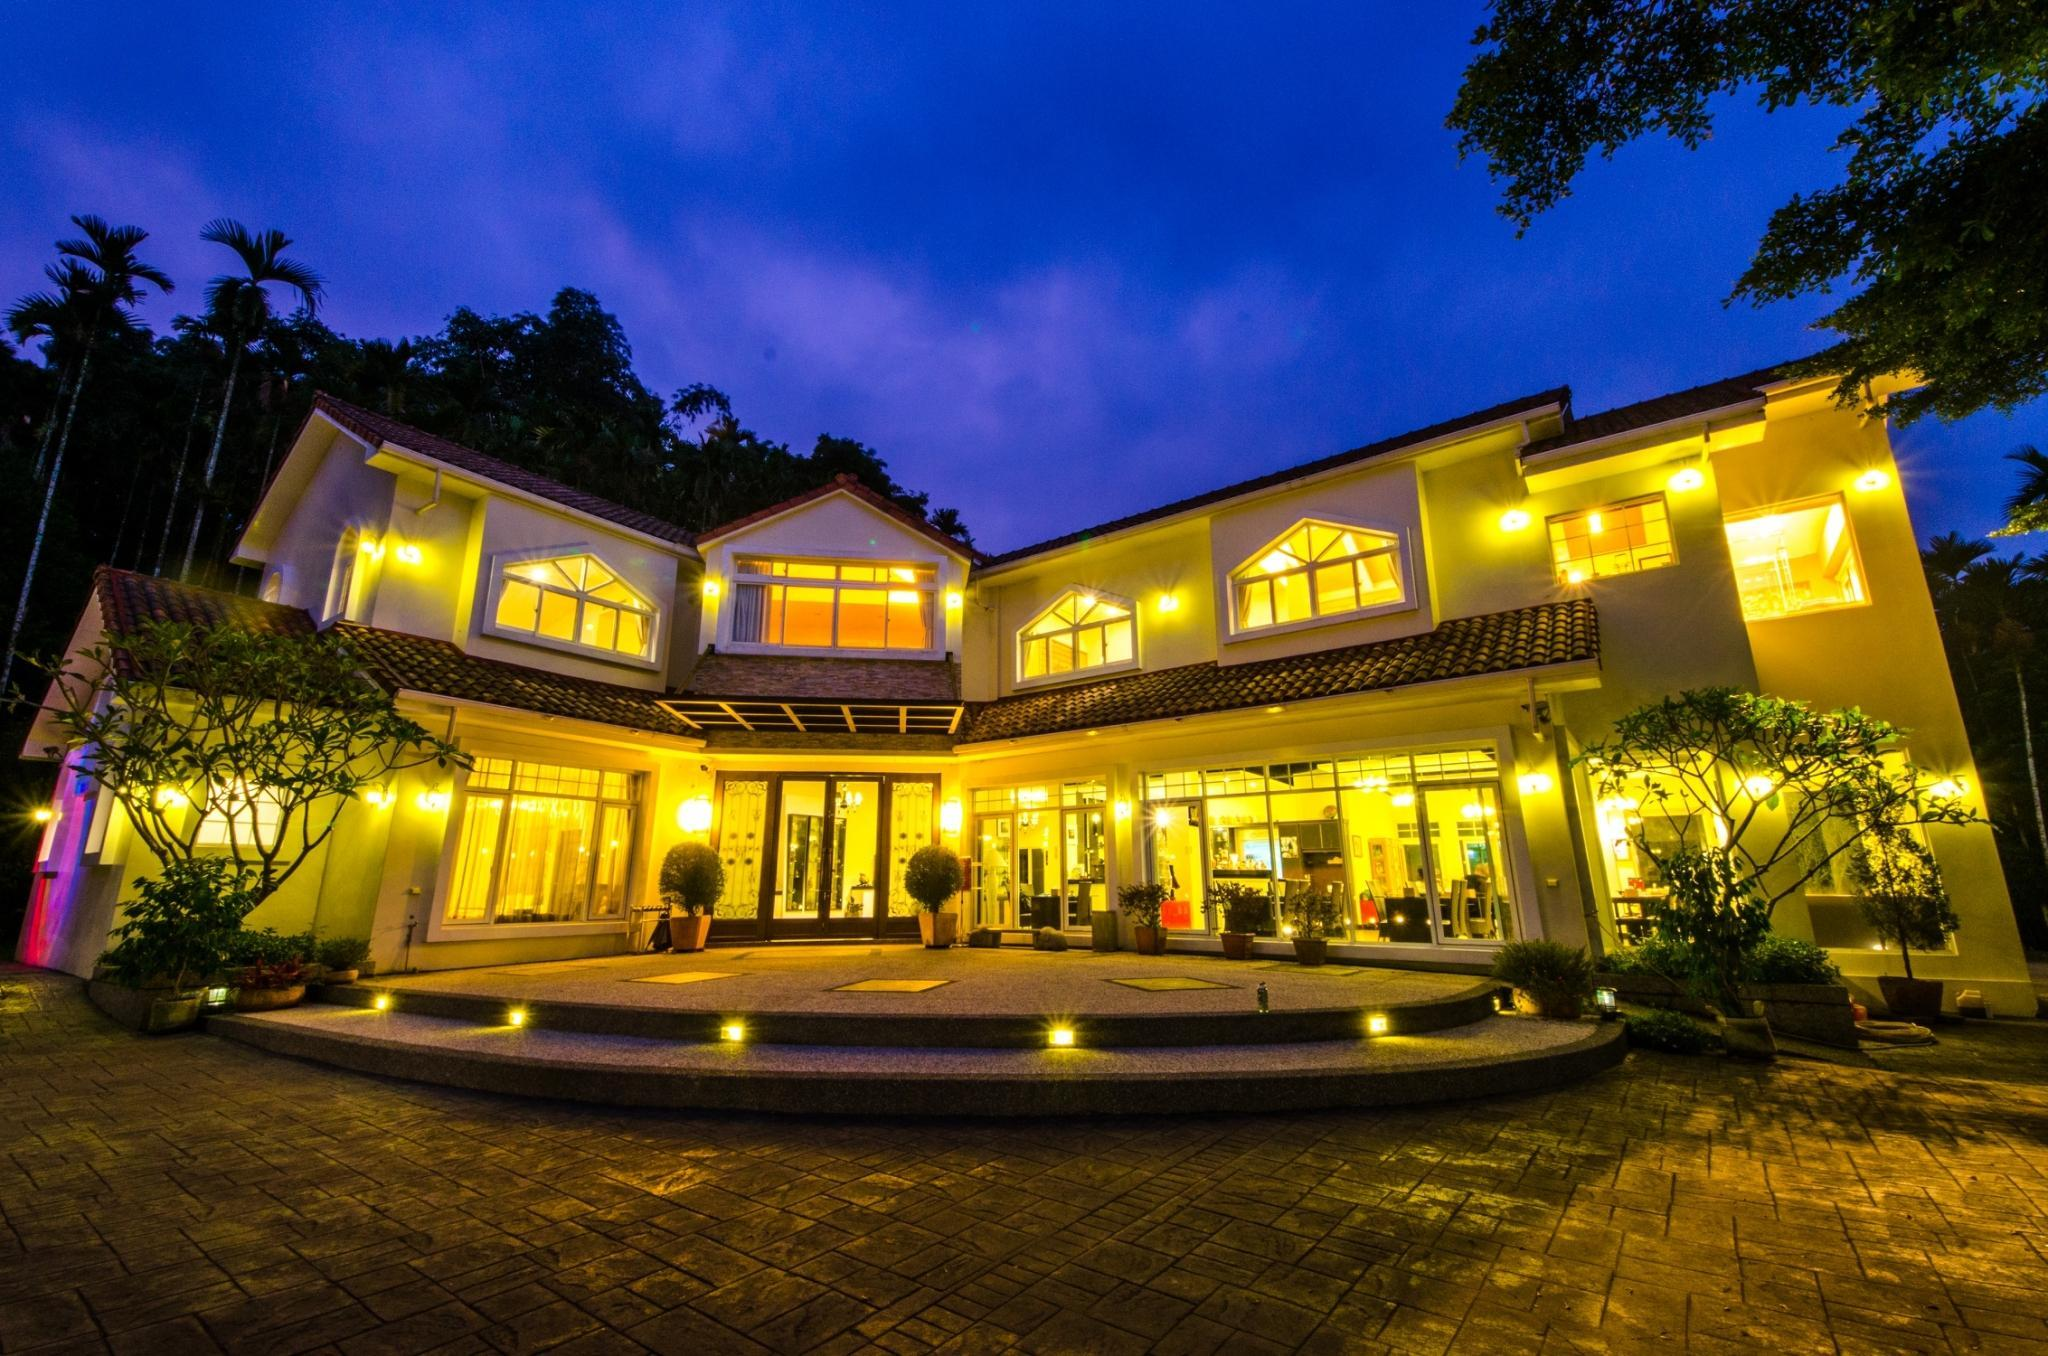 Butchard Villas